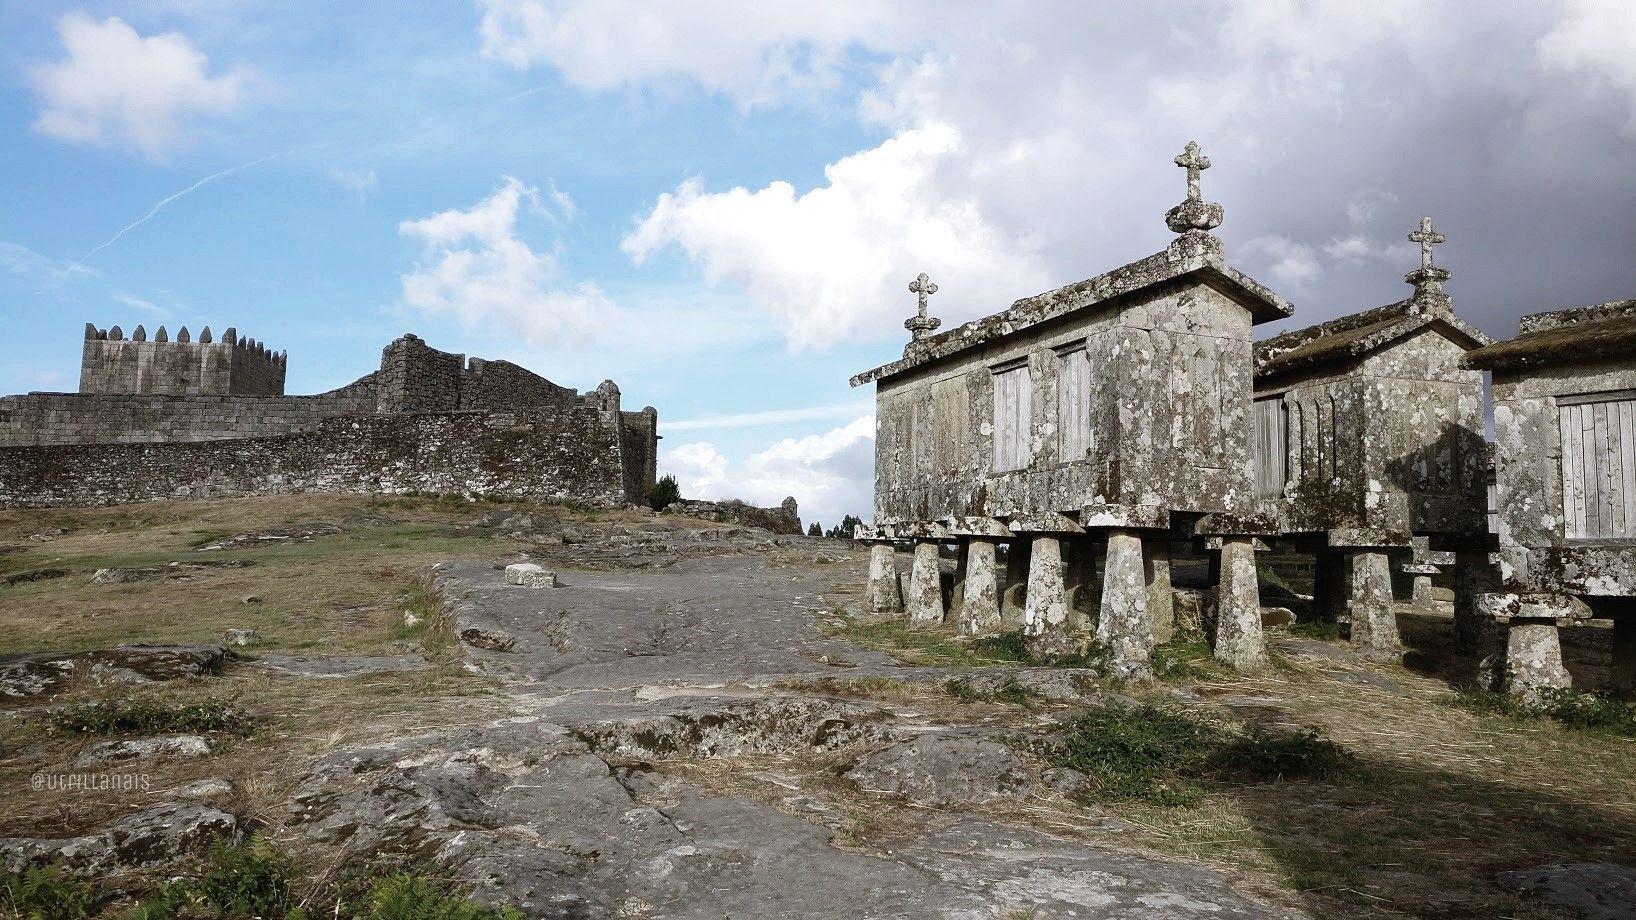 Vistas de Castillo y hórreos en Lindoso, Portugal #TurismoRural #SlowLife #SlowInteriorDesign #AnaUtrillaInteriorimo @Utrillanais